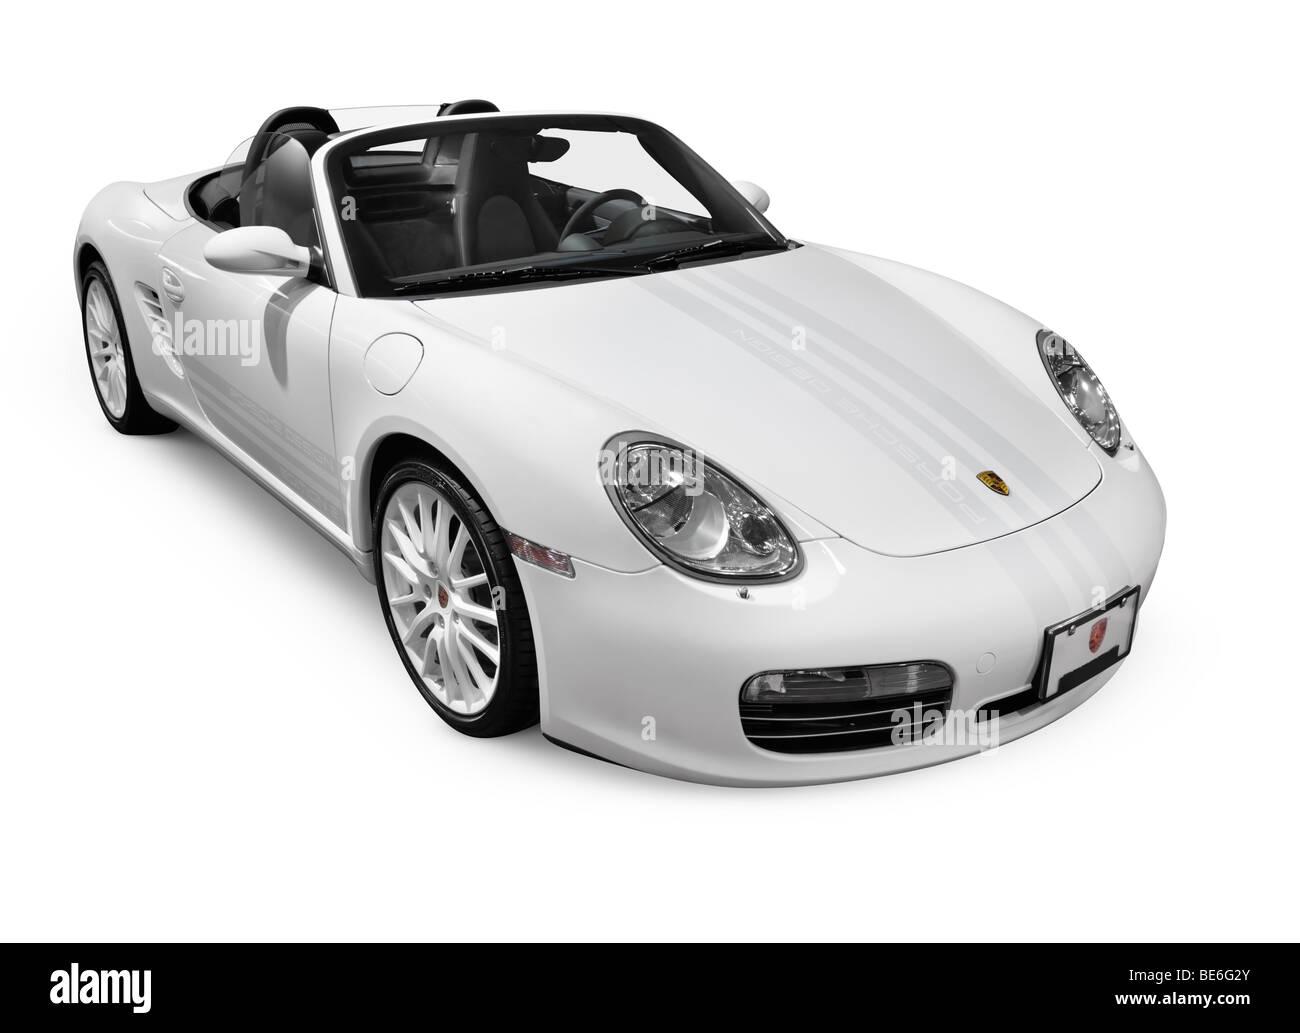 Porsche Stockfotos Amp Porsche Bilder Alamy